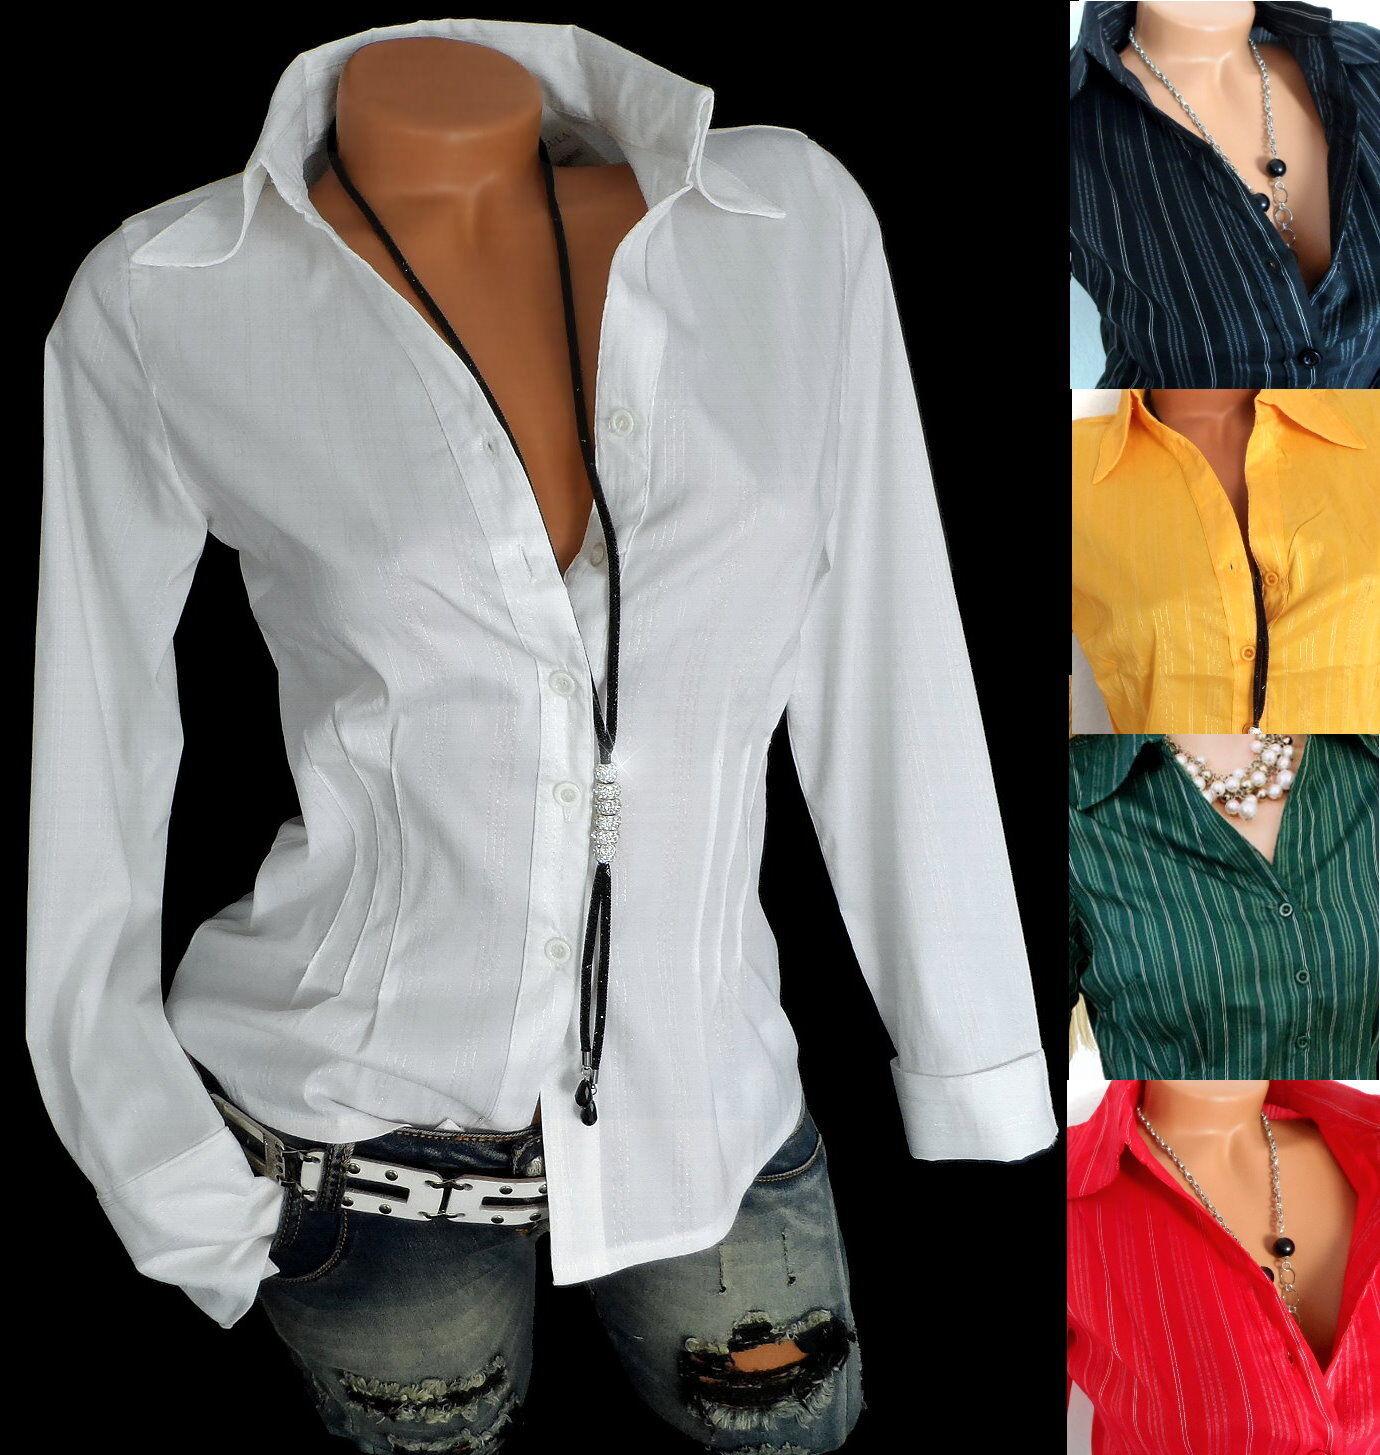 quality design 7a6e9 f3735 Bluse Damen Abend Vergleich Test +++ Bluse Damen Abend Angebote!